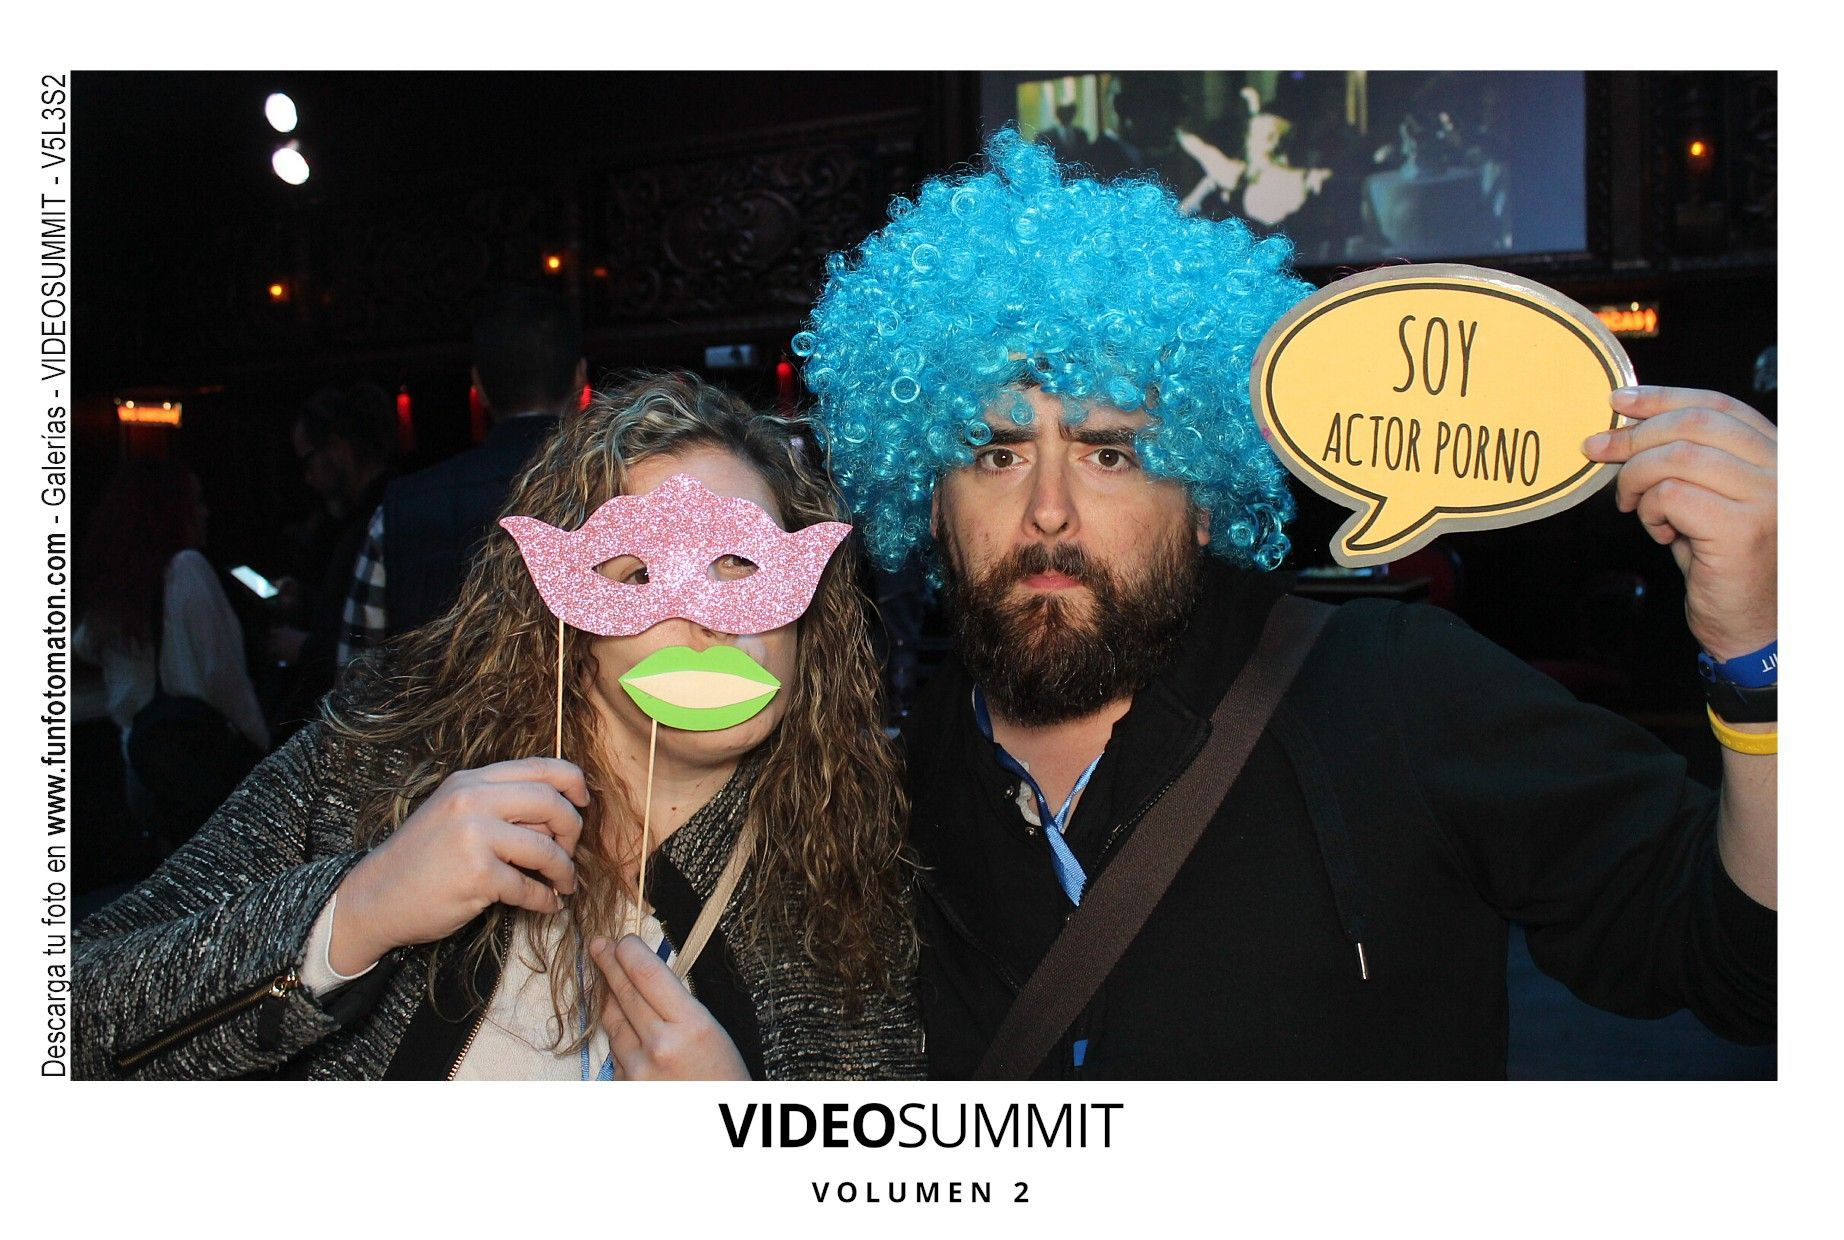 videosummit-vol2-club-party-049